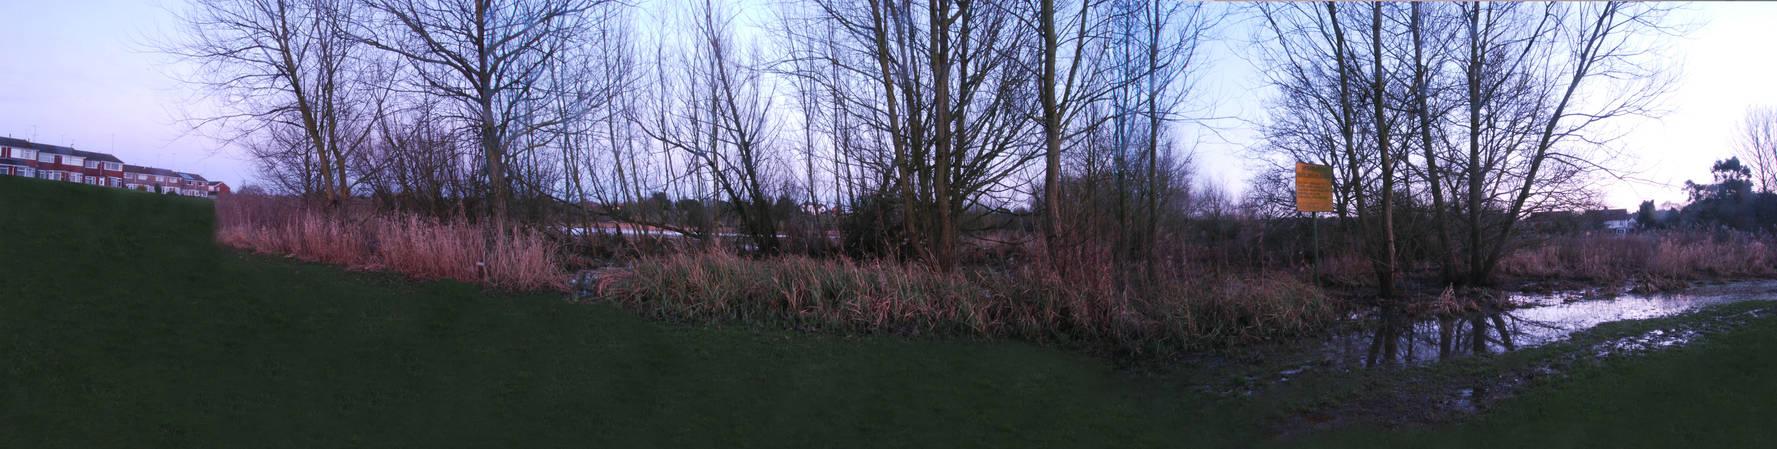 WAITING FOR THE SUNSET, Stoke Floods, WestMidlands